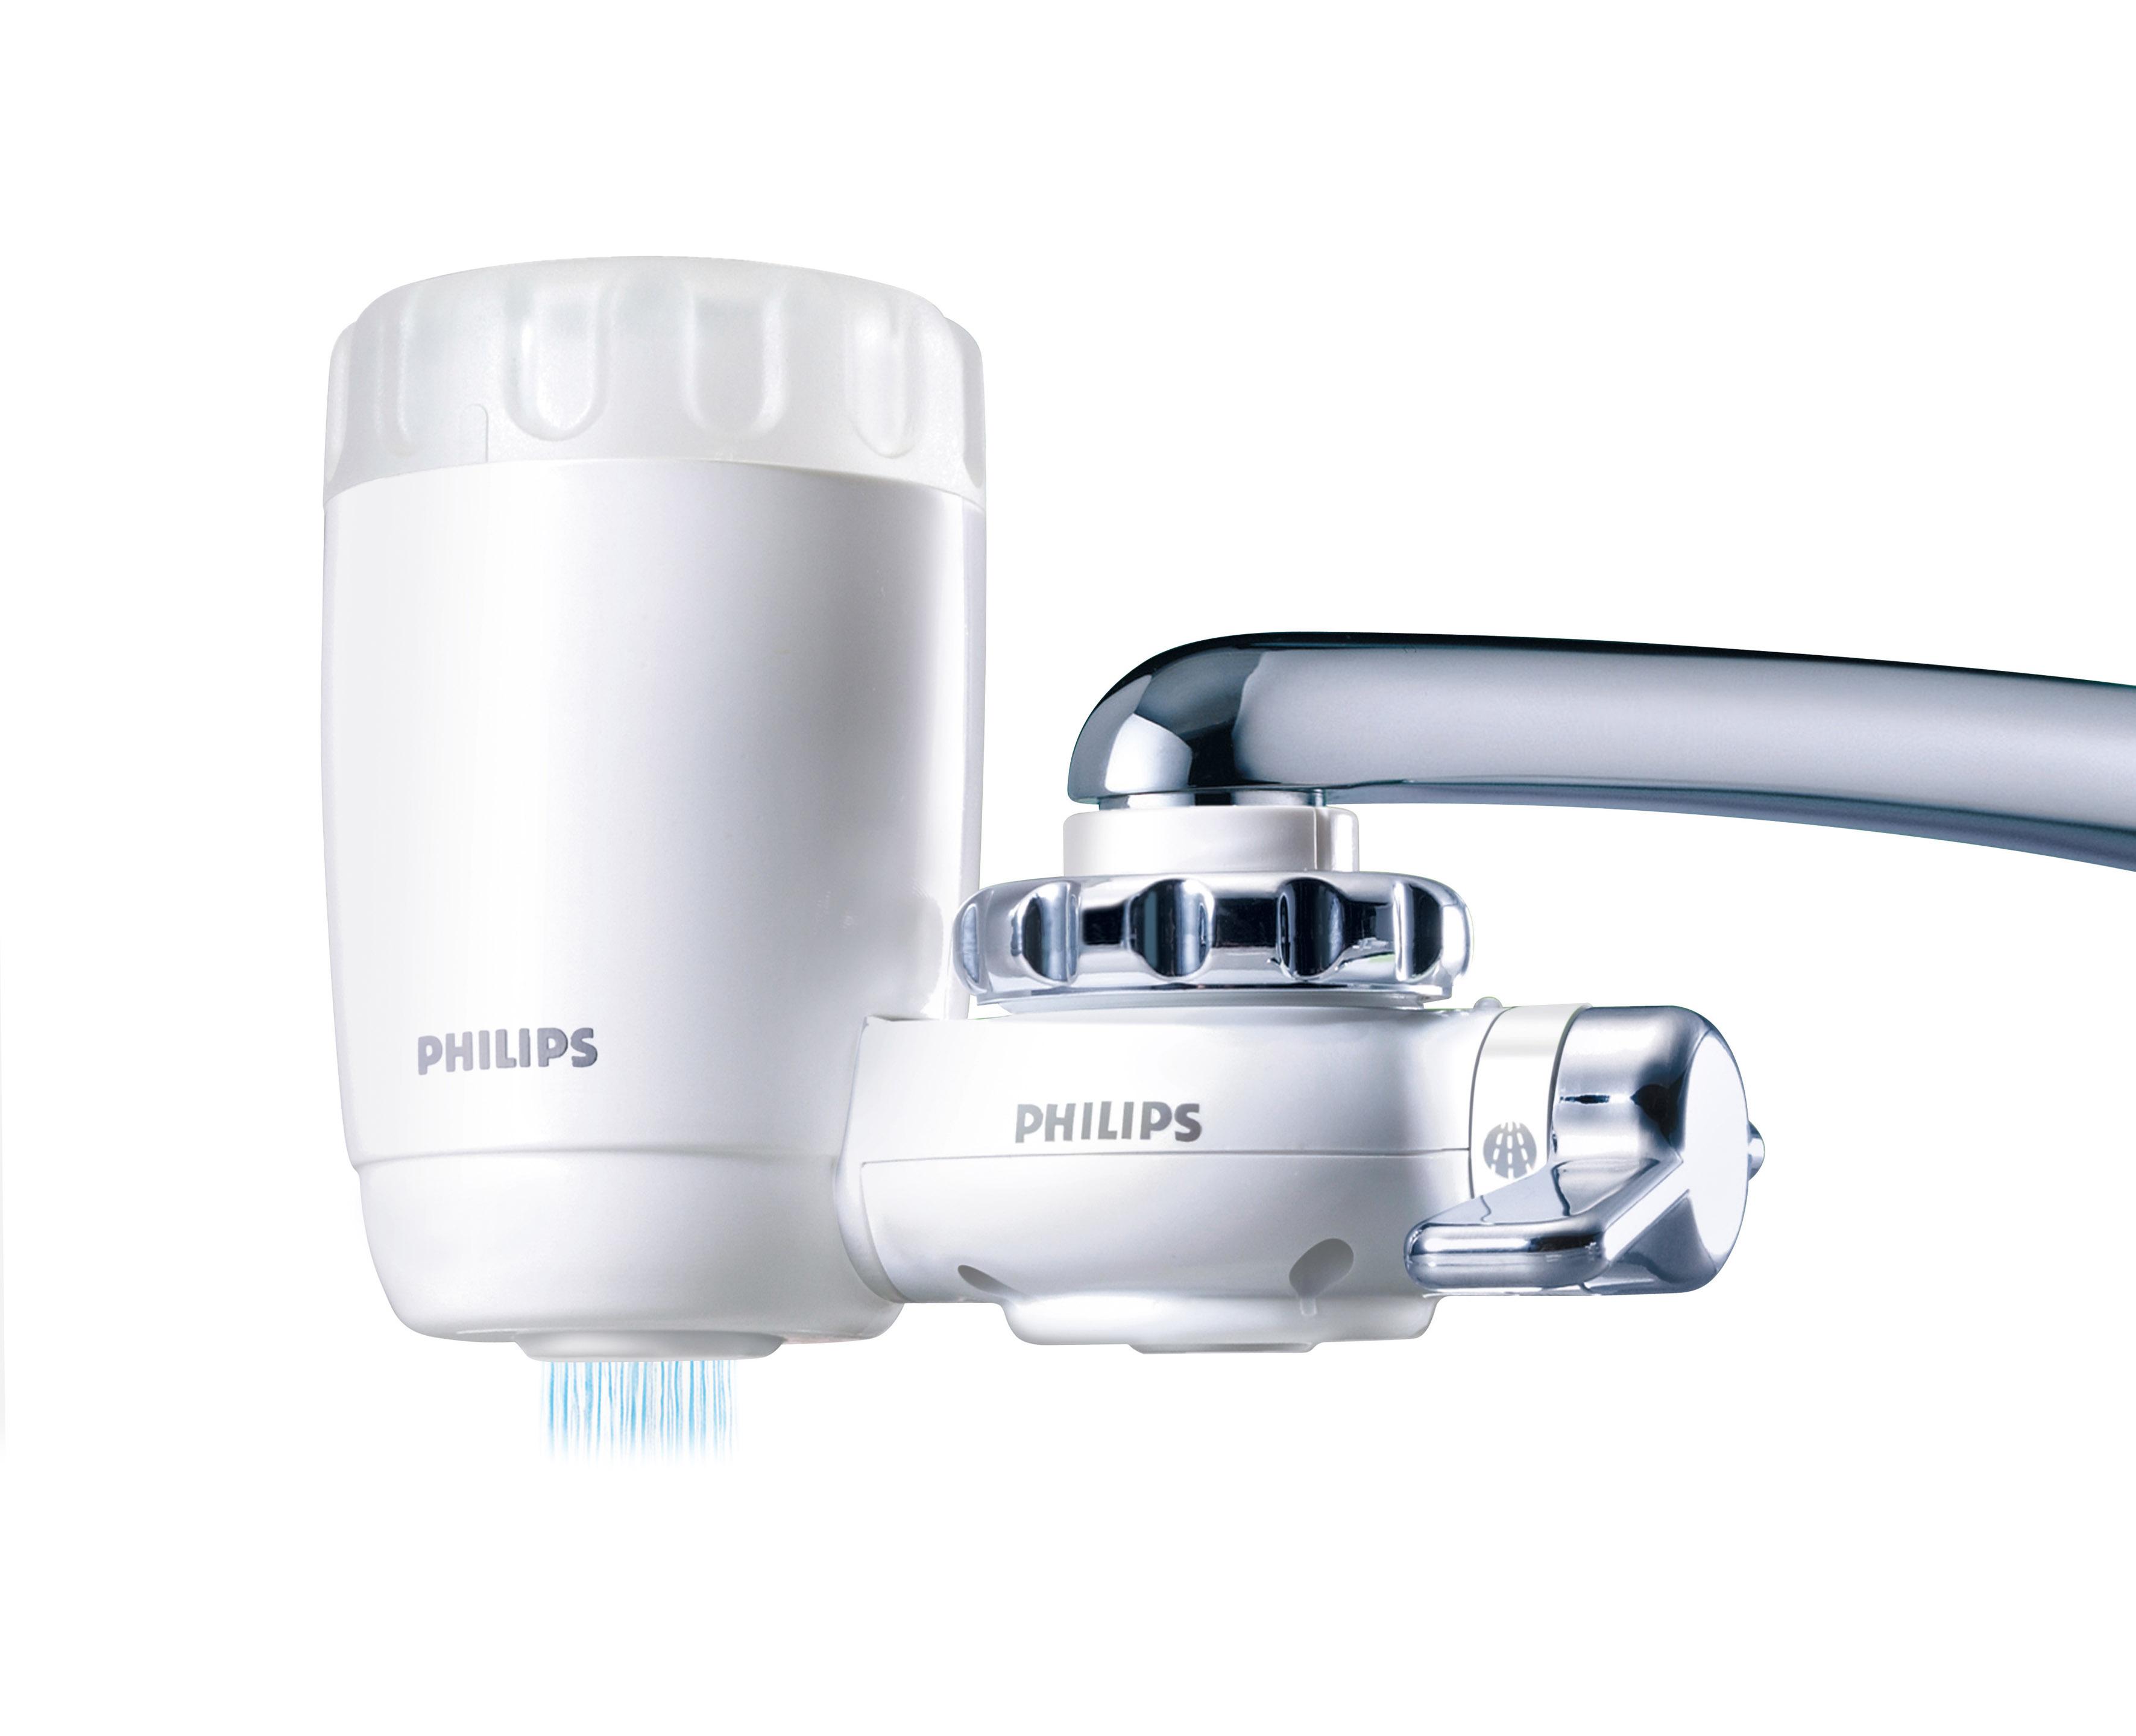 Purificador Agua Philips Purificador Agua Philips